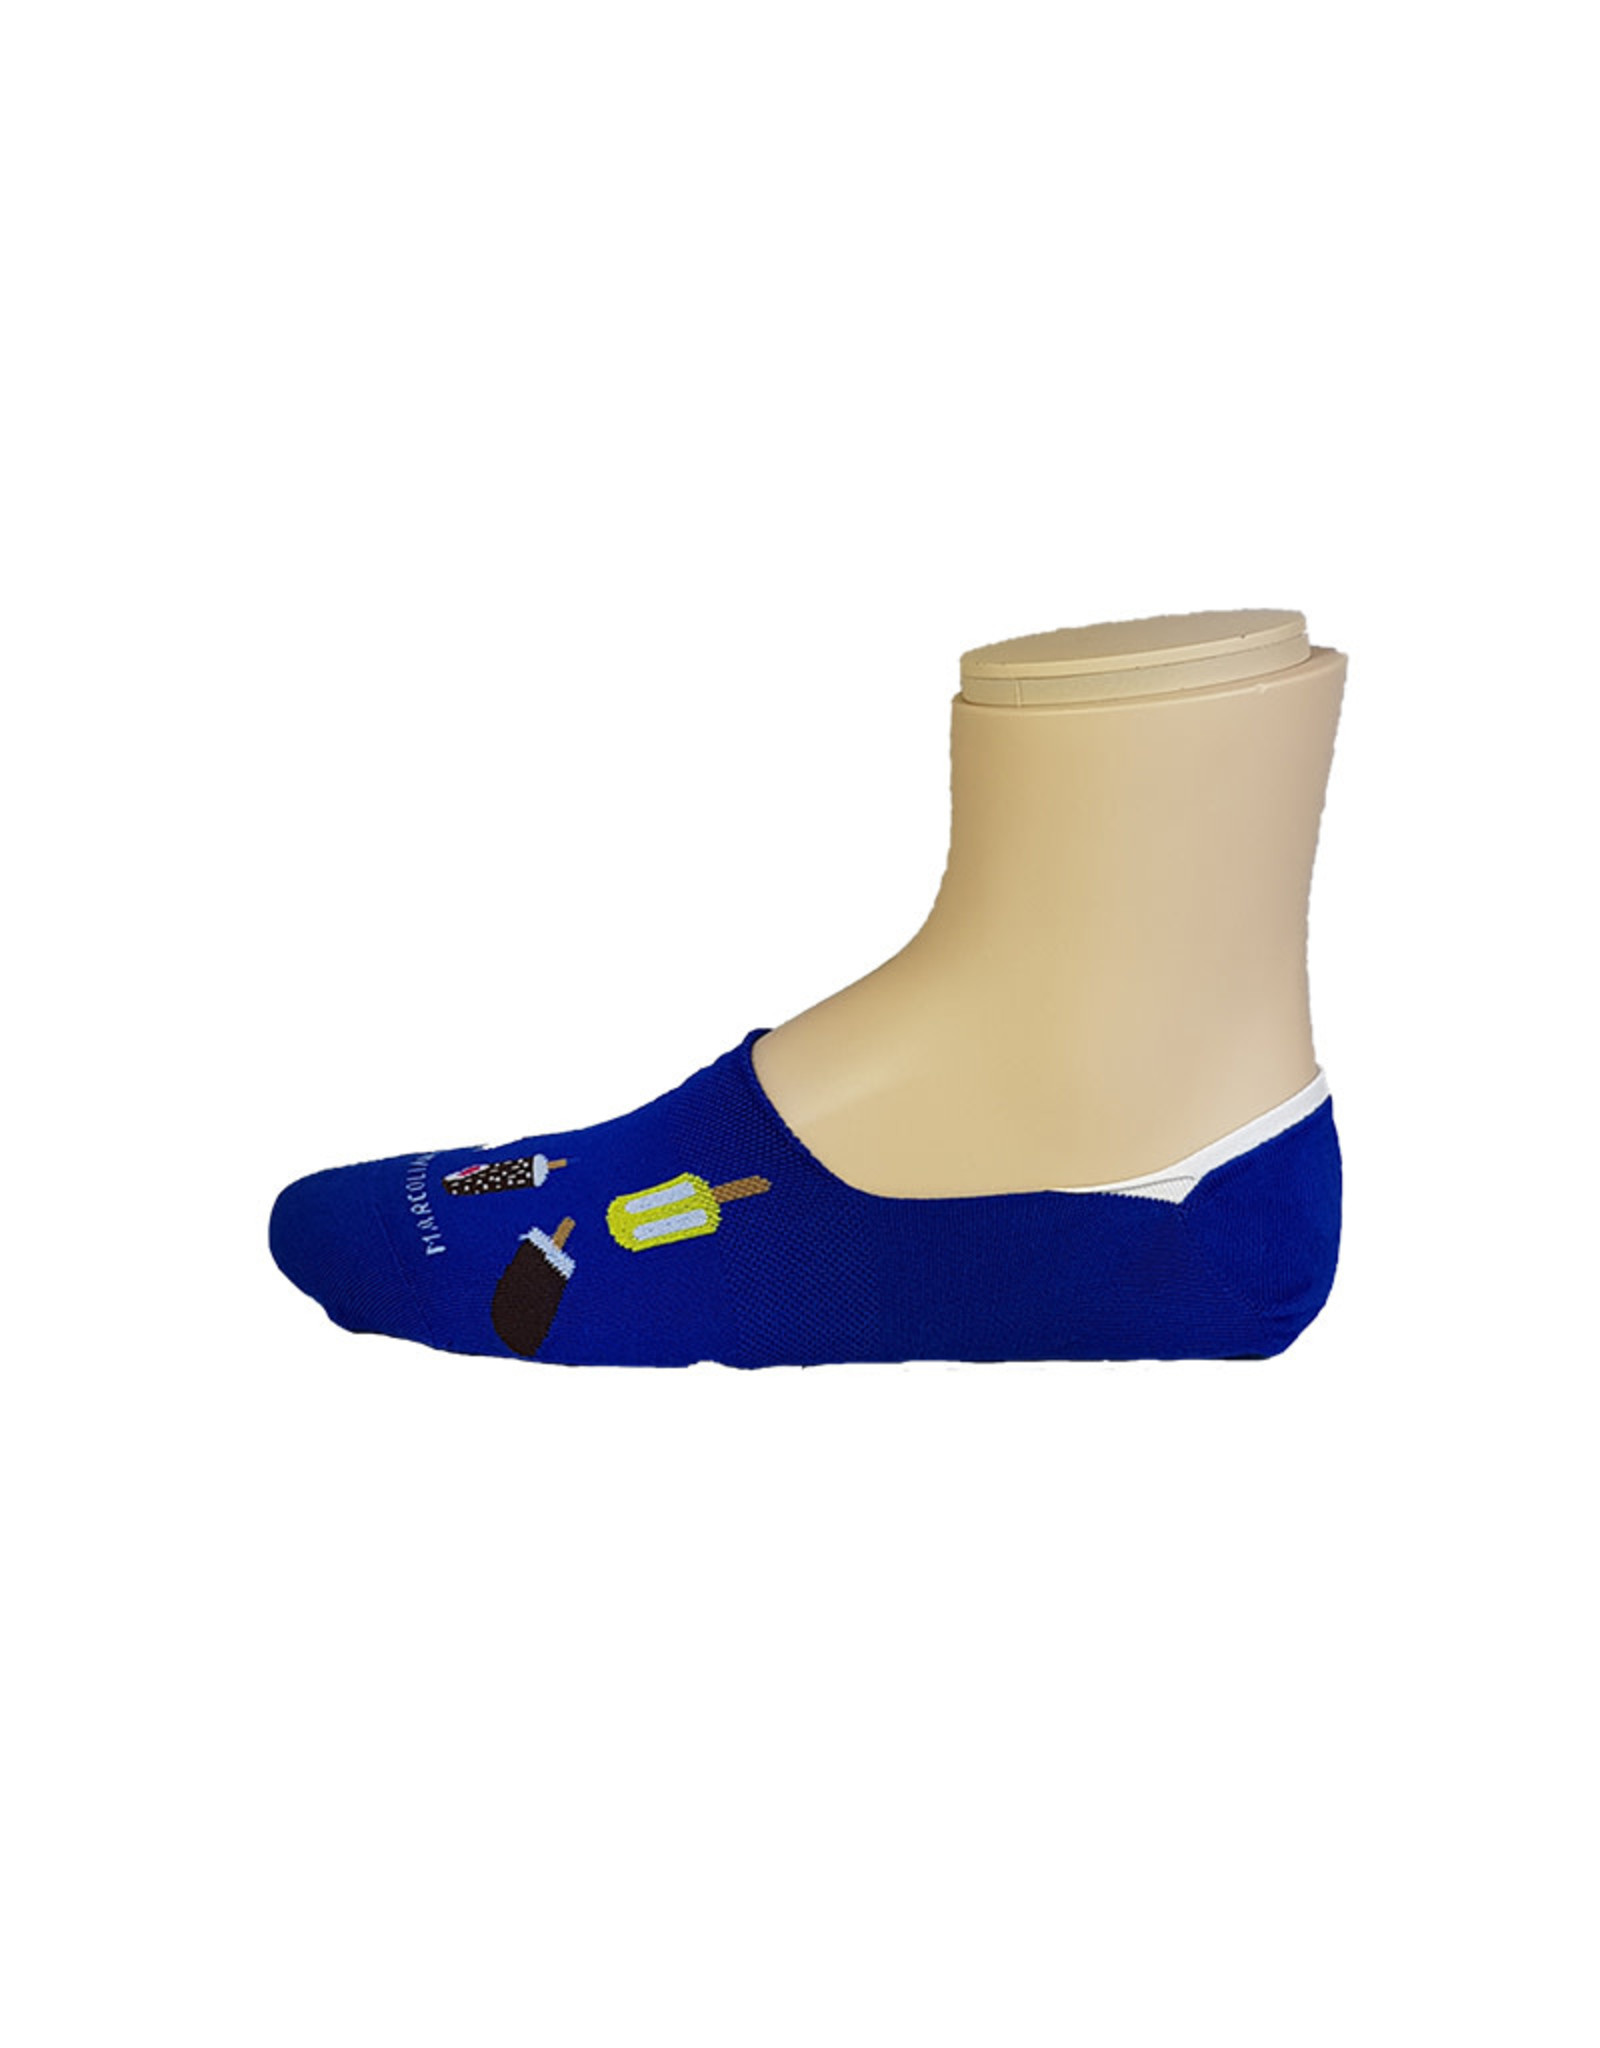 Marcoliani Marcoliani sokken blauw ijsjes Invisible 4379S